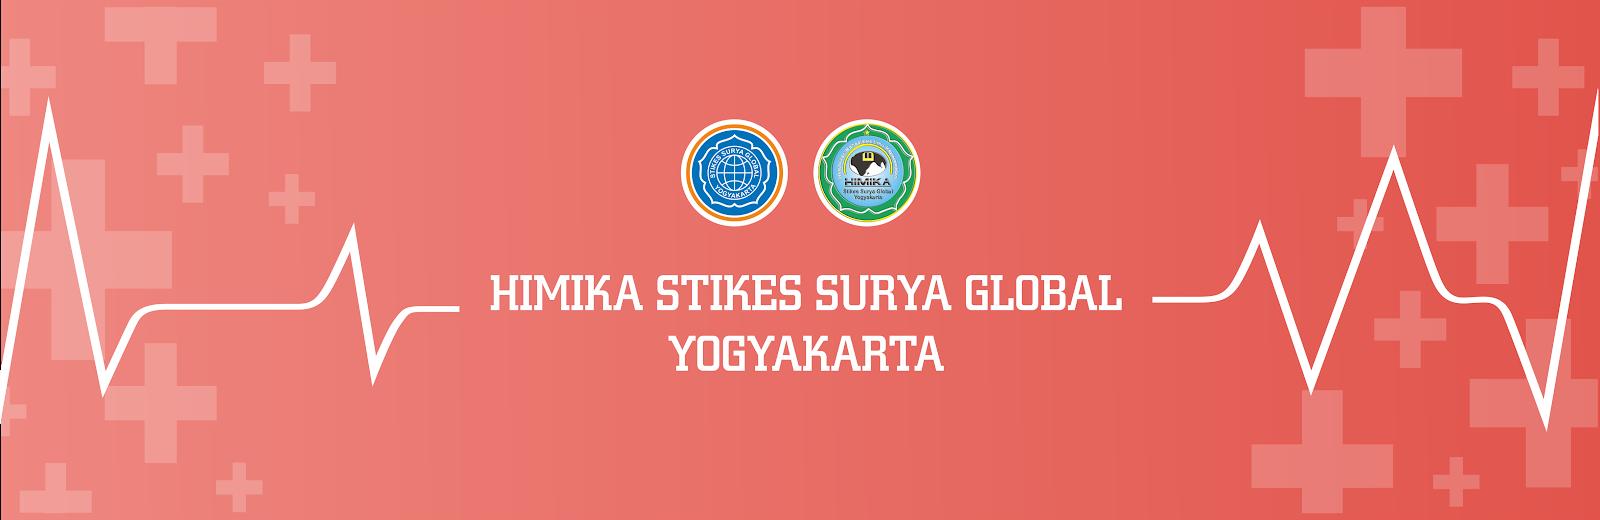 HIMIKA STIKes Surya Global Yogyakarta